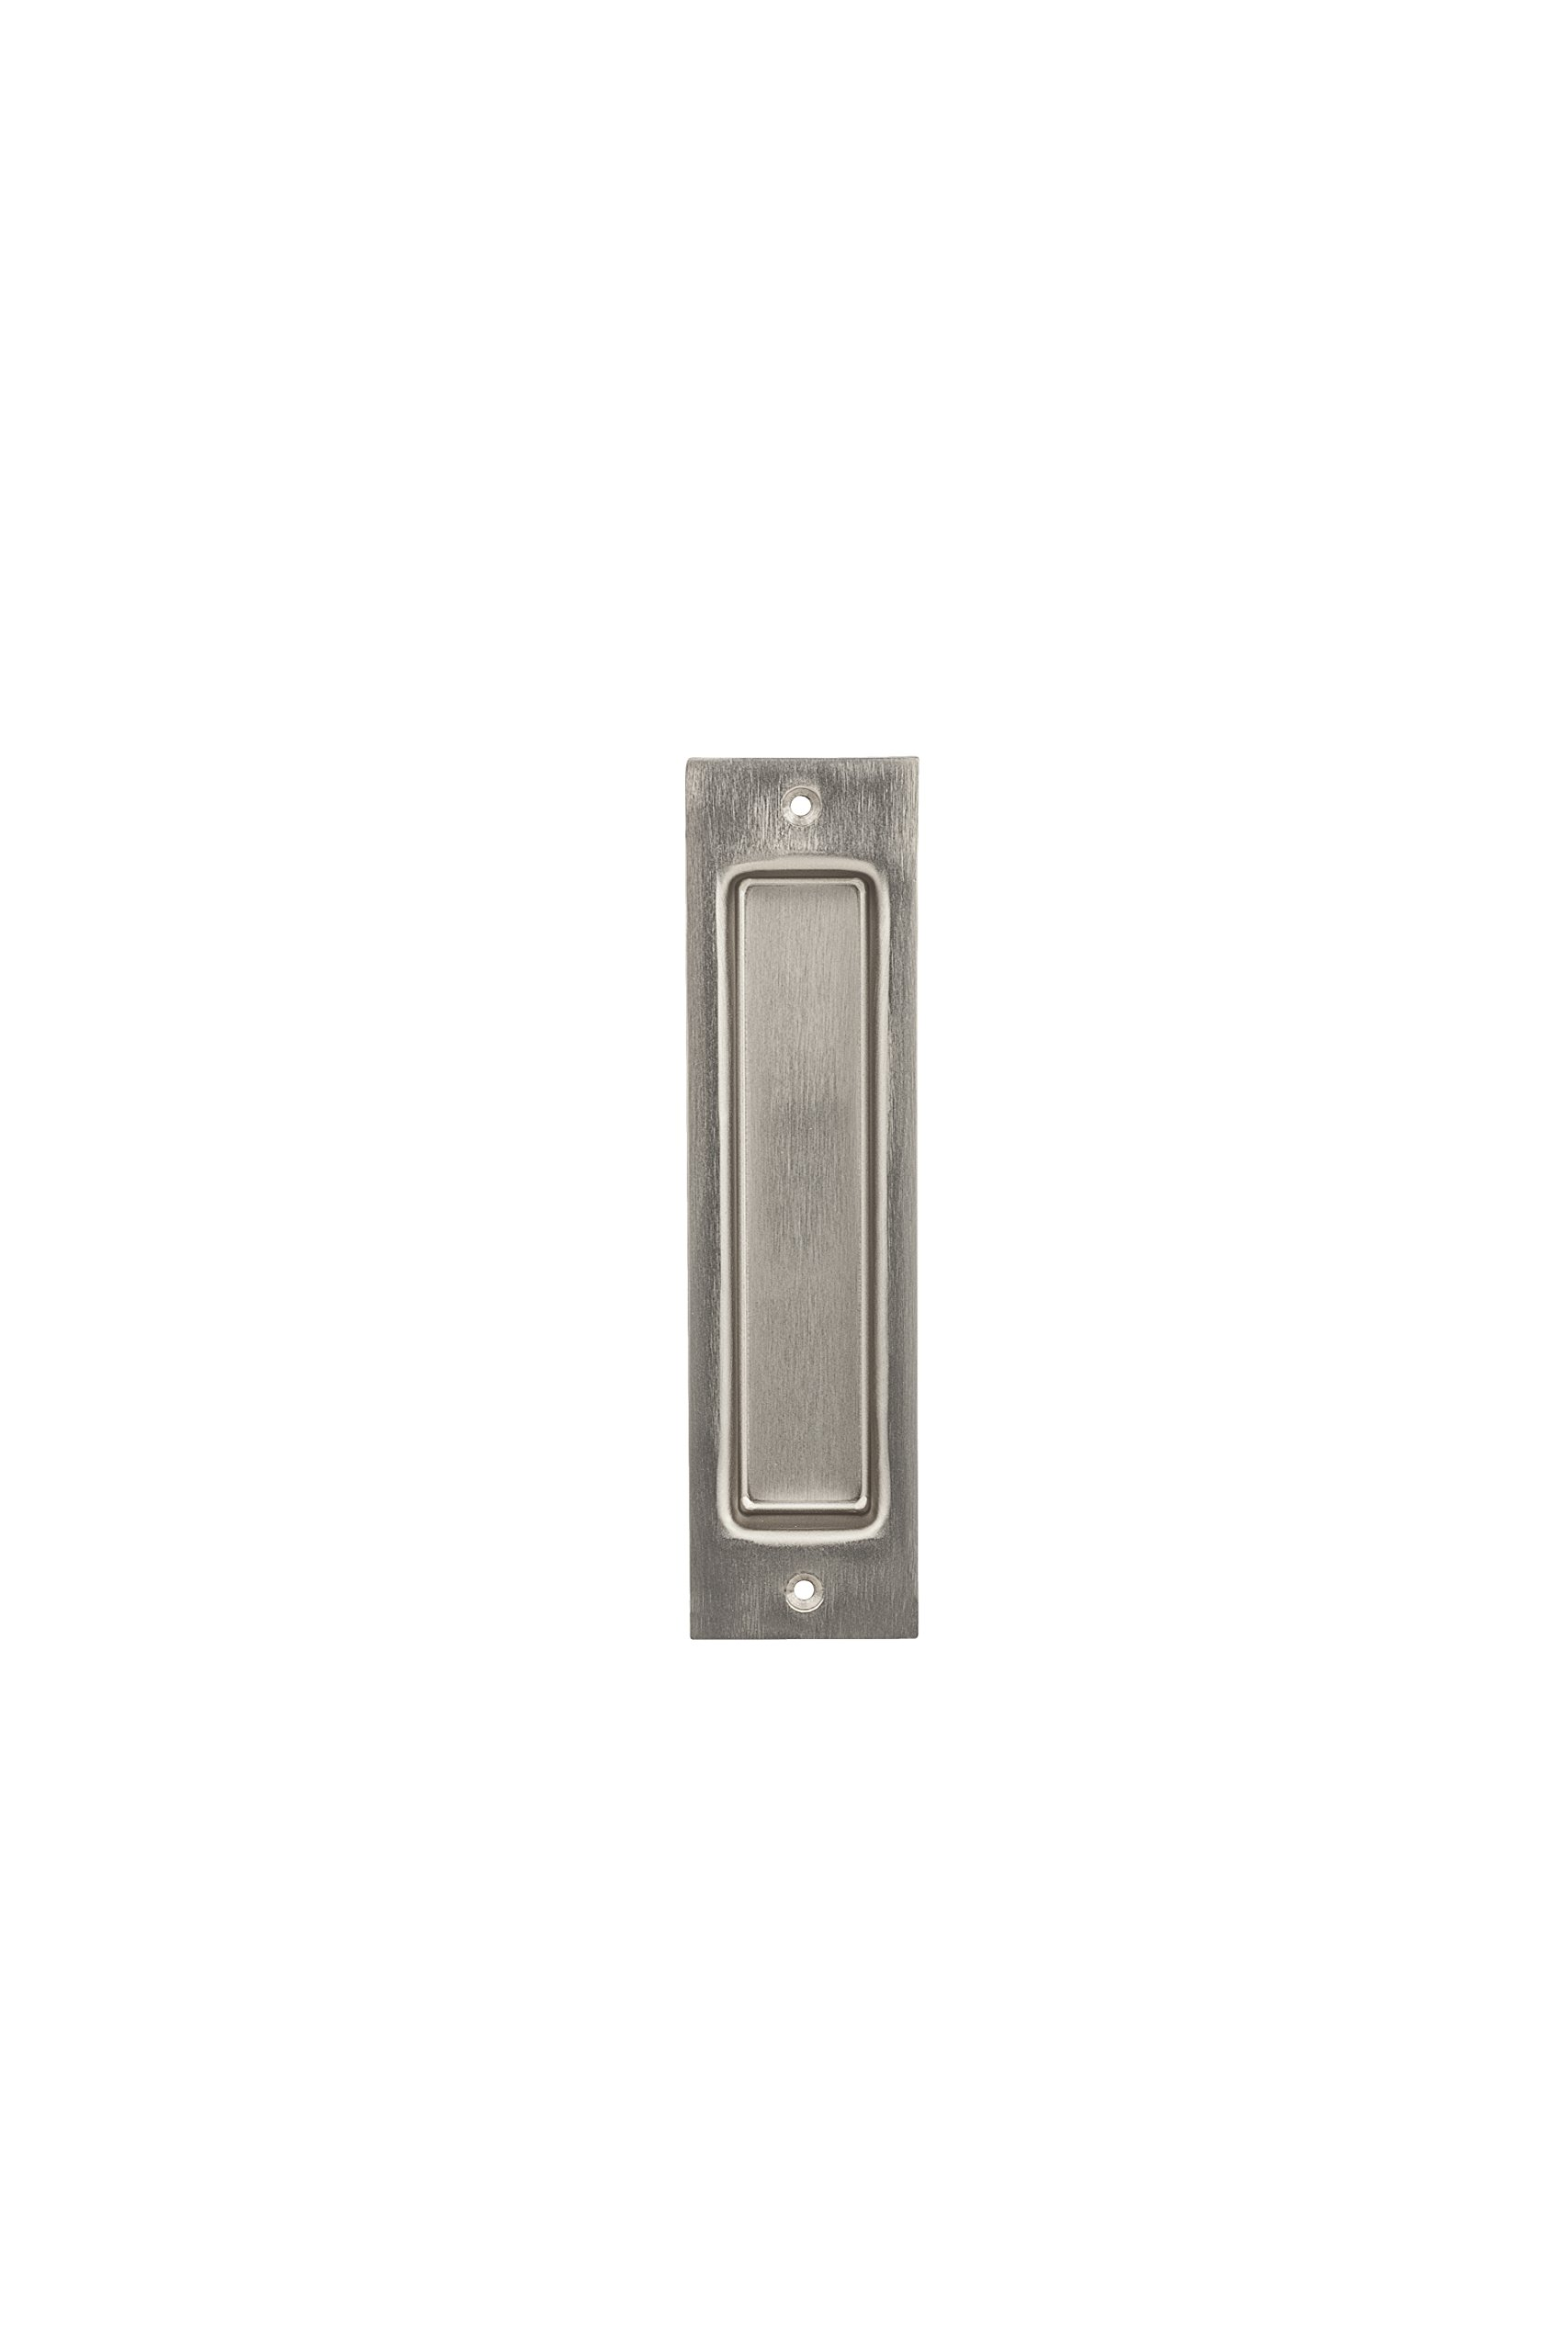 National Hardware N187 – 024 Flush Pull, níquel satinado: Amazon ...